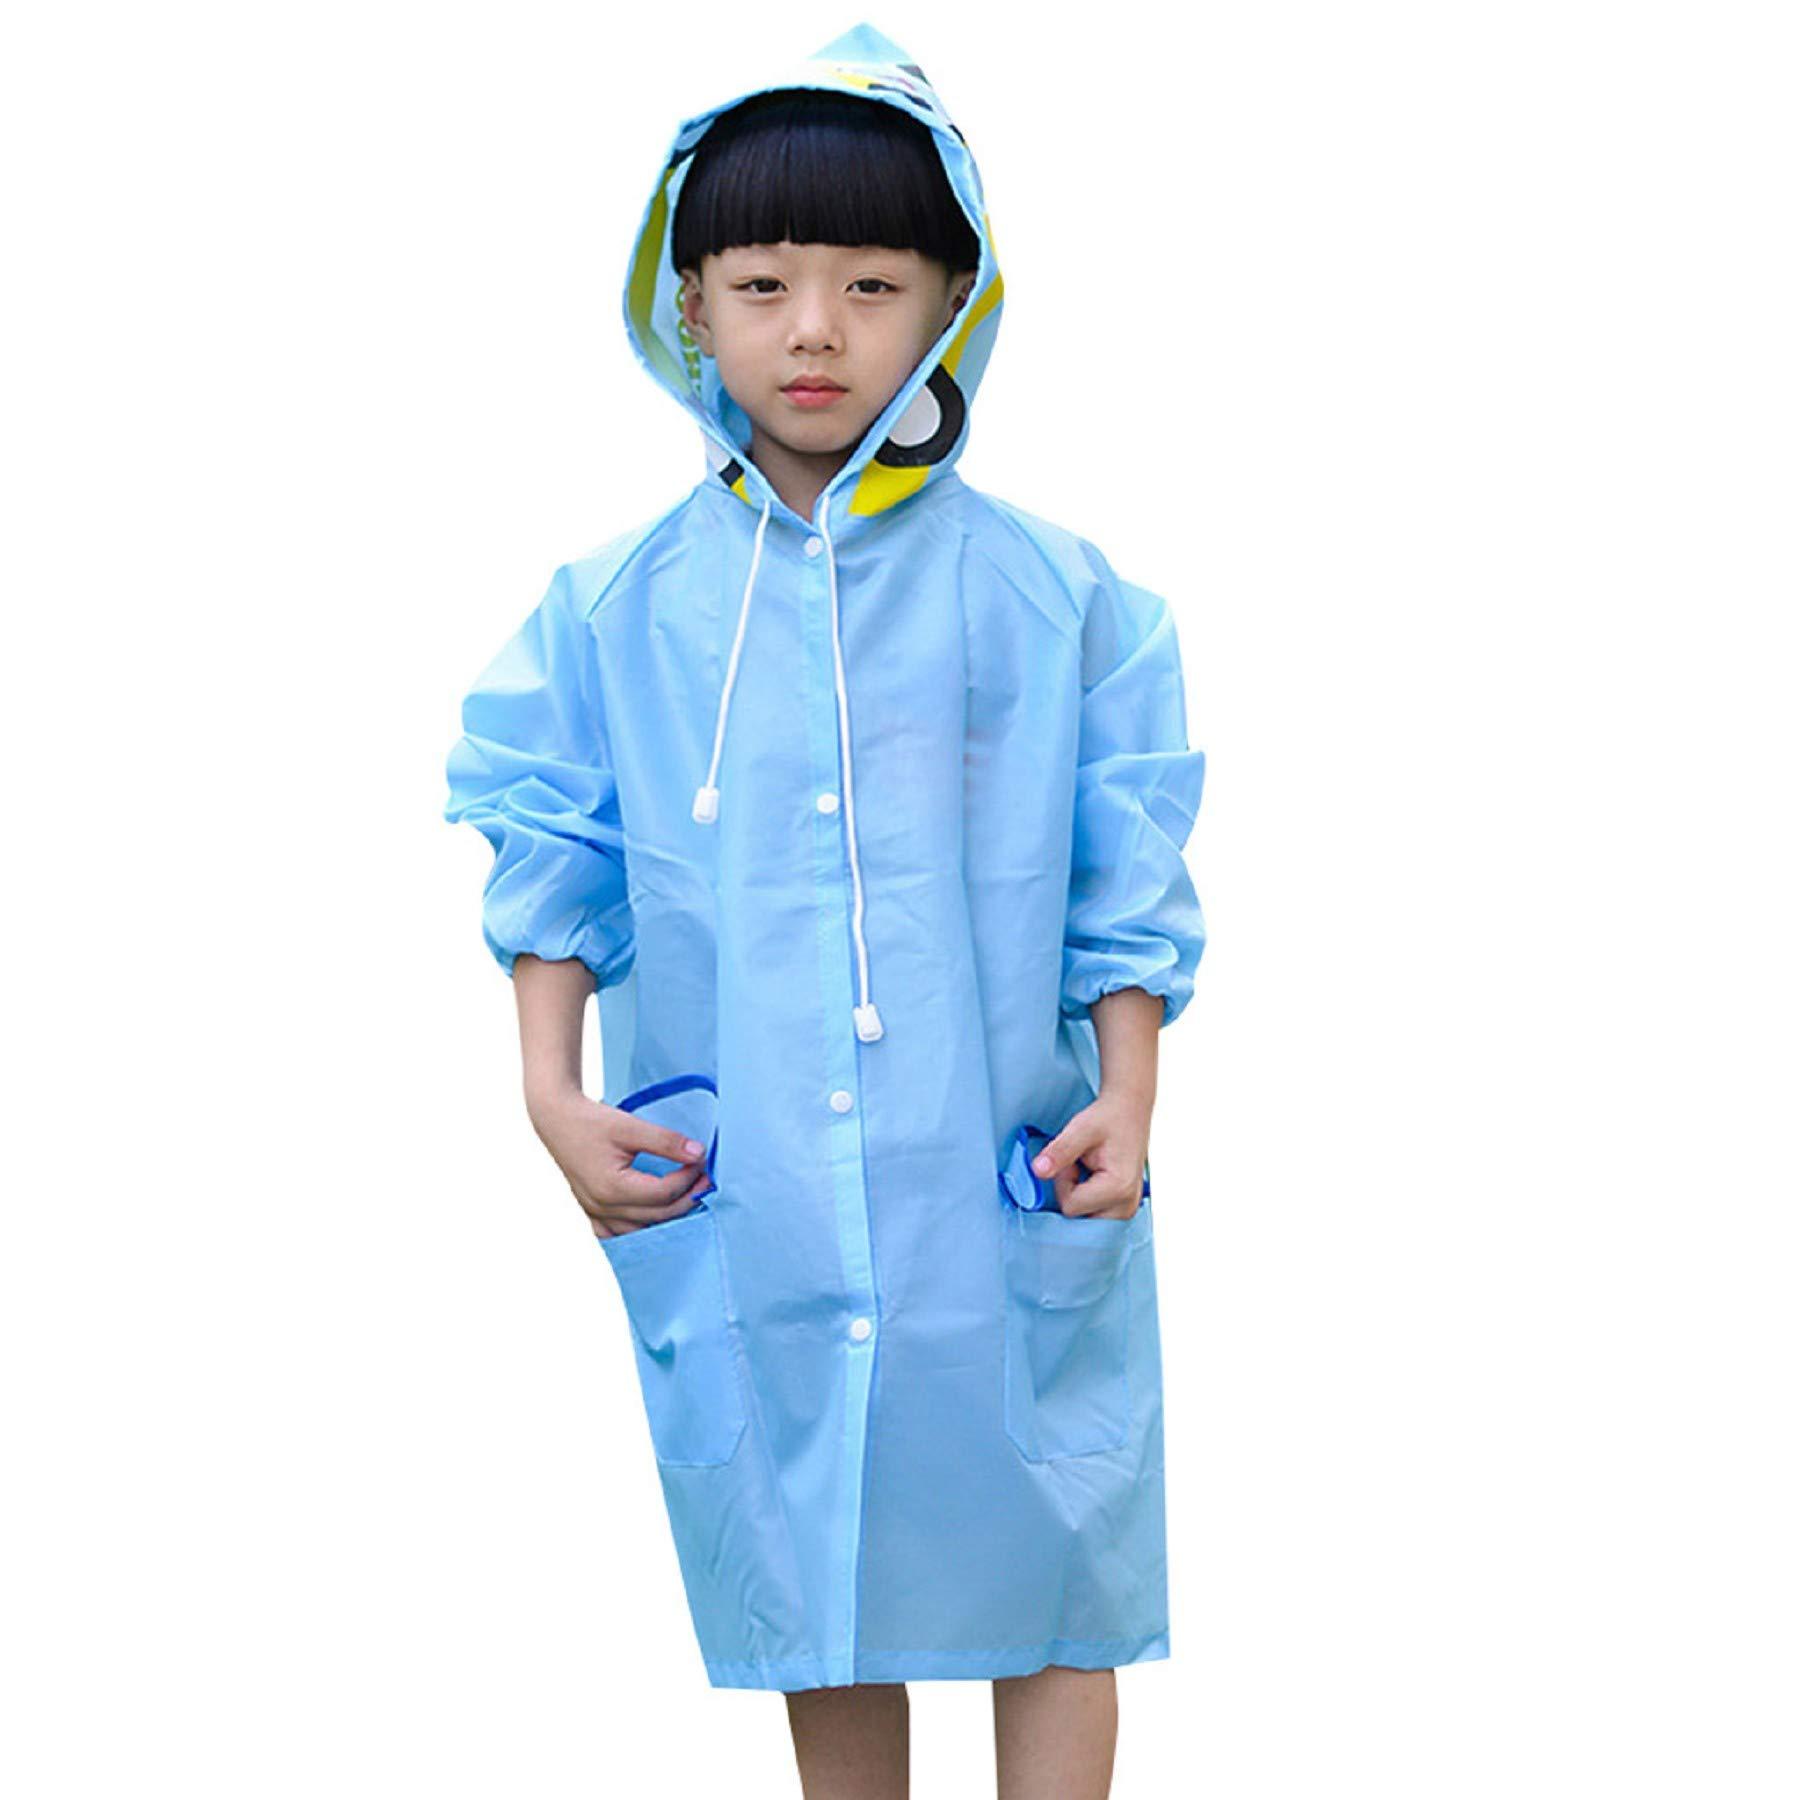 Leedford Kids Raincoat, Children's Waterproof Rainwear Carton Waterproof Hood Jacket Outdoor Age 2~12 (Free Size, Blue)